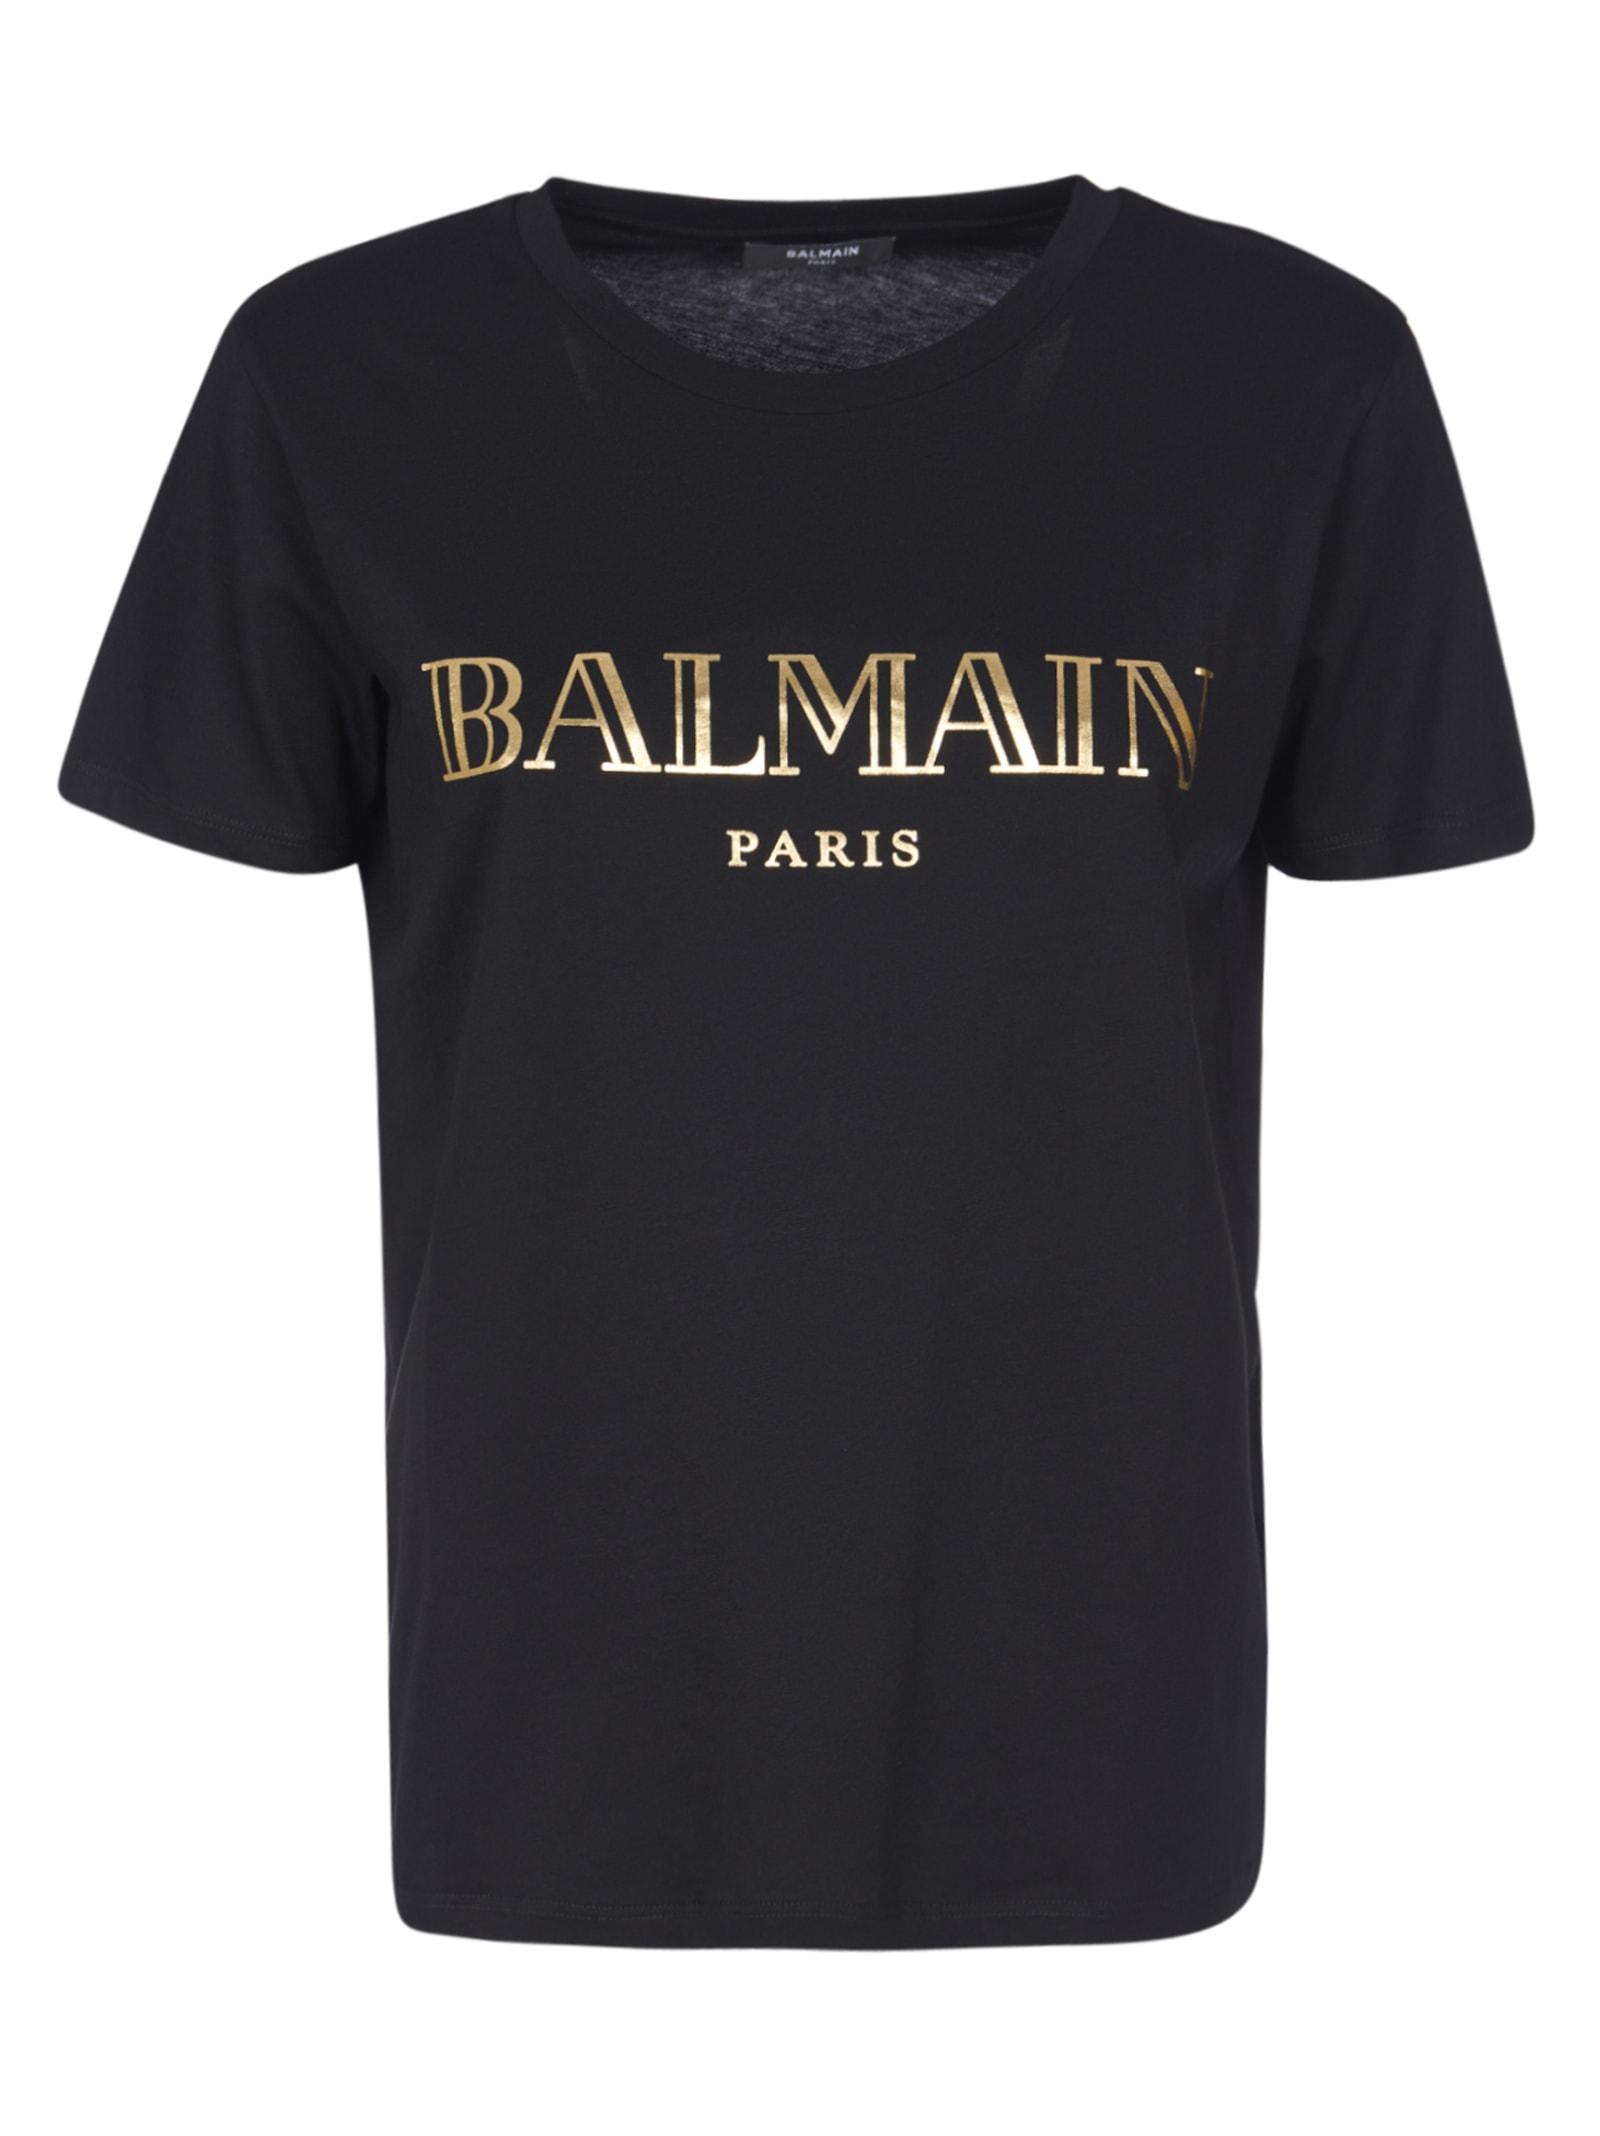 Balmain Paris Printed T-shirt